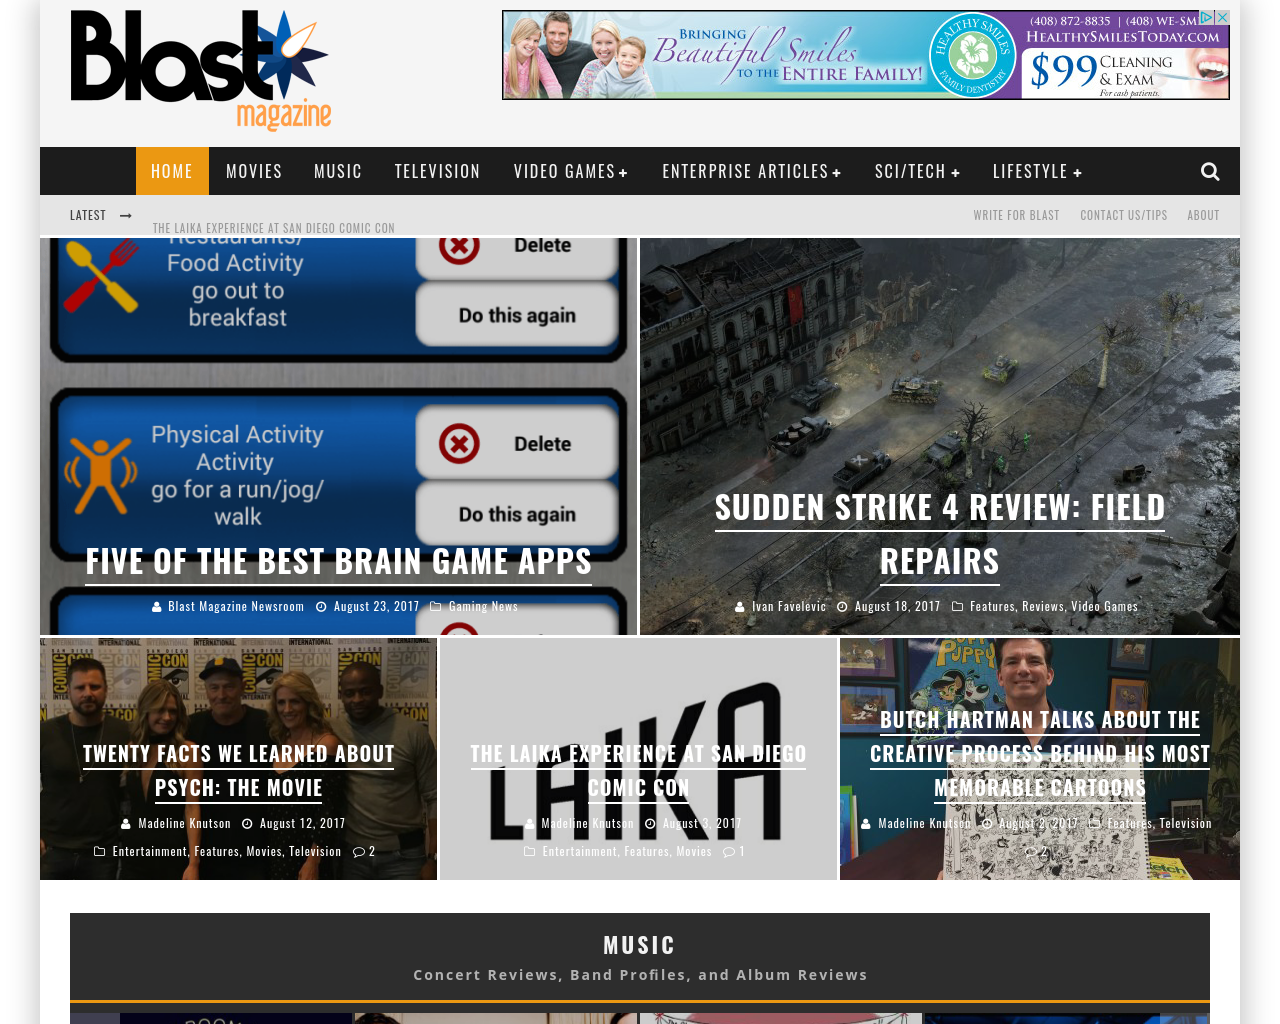 Blast-Magazine-Advertising-Reviews-Pricing